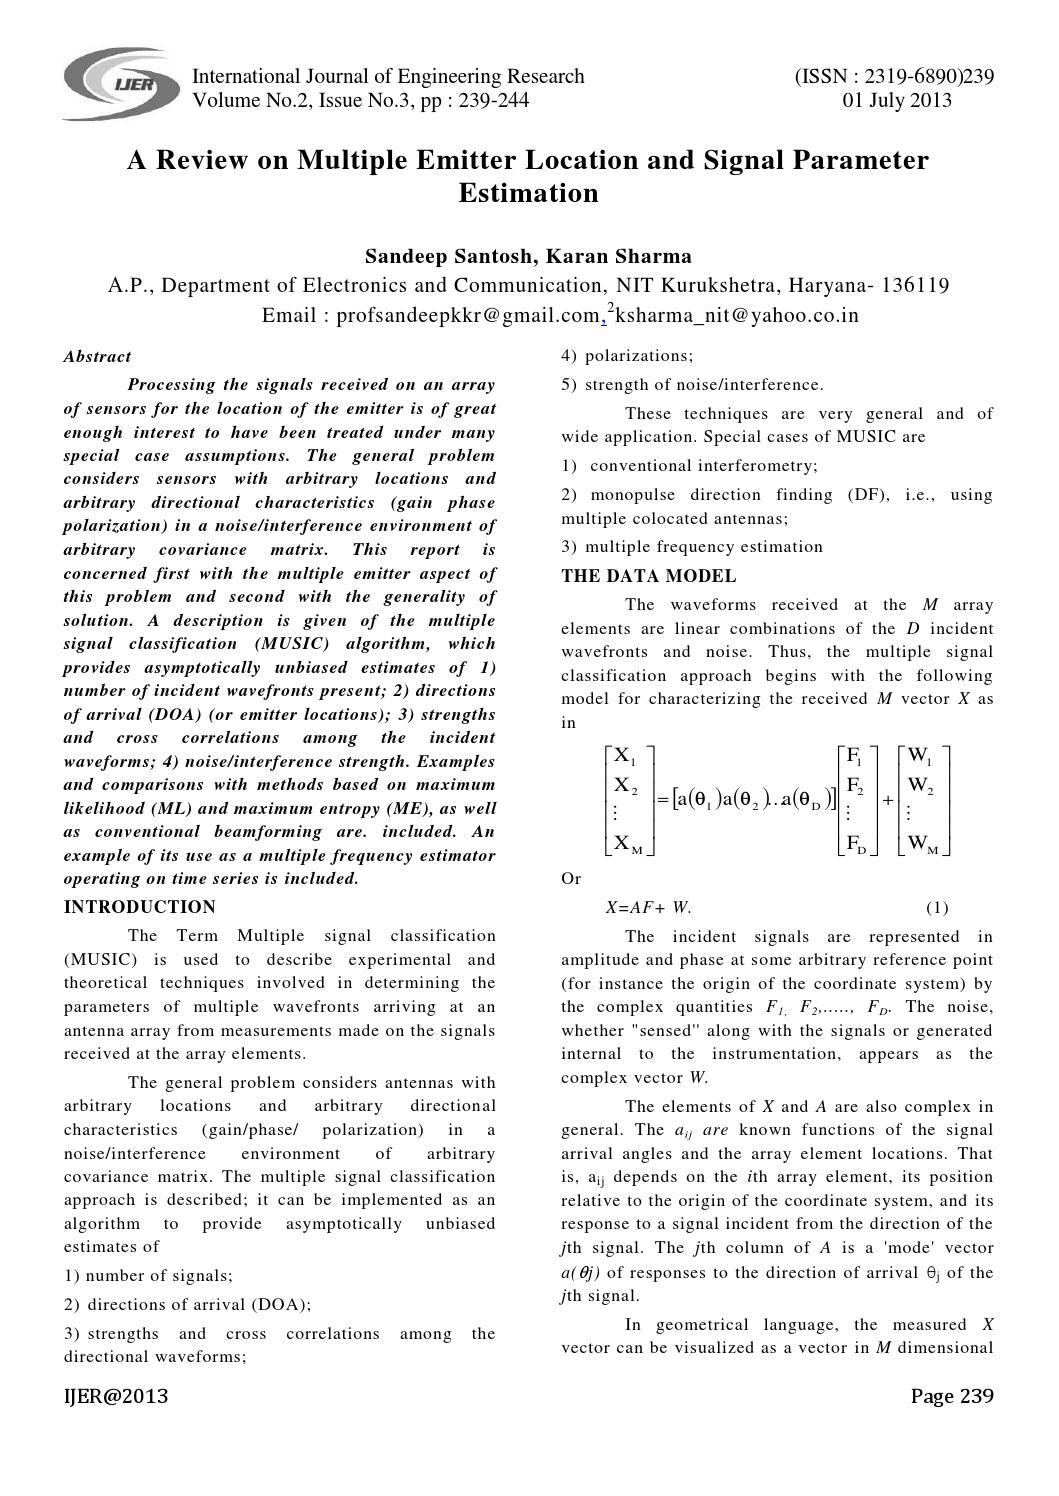 Multiple emitter and signal parameter estimation pdf